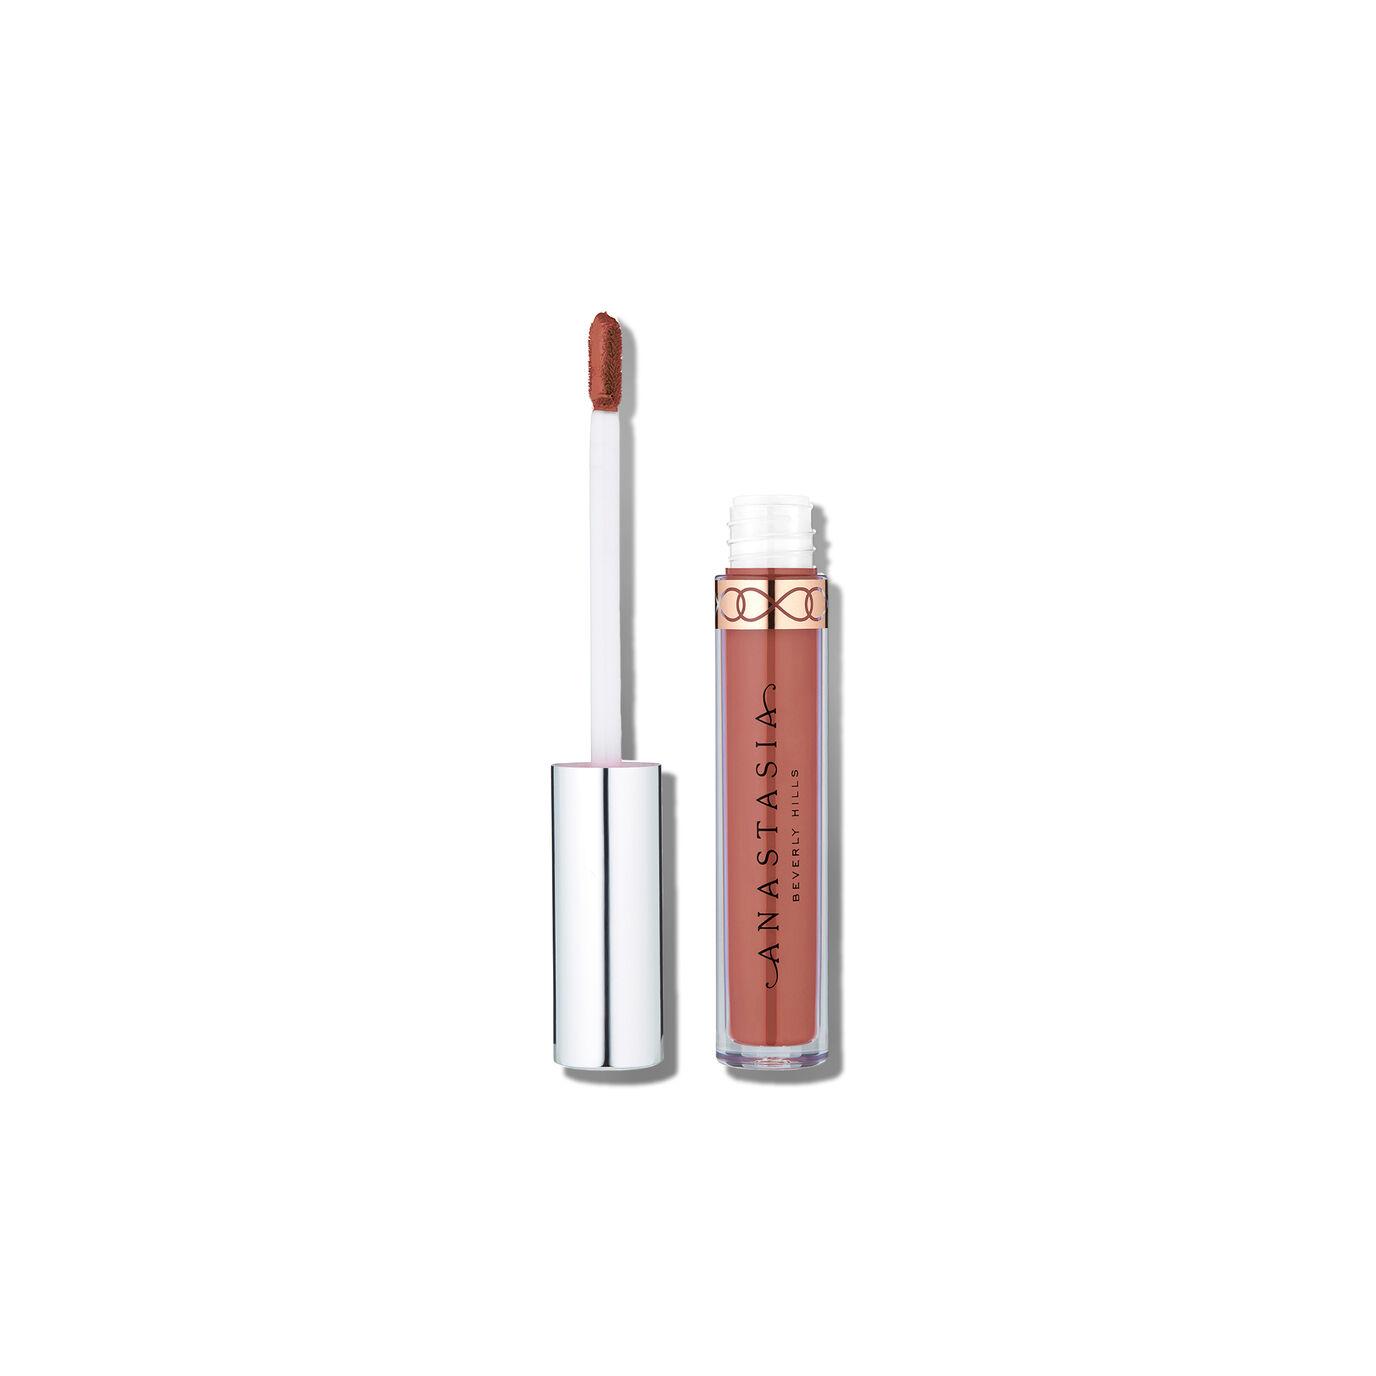 Liquid Lipstick - Stripped